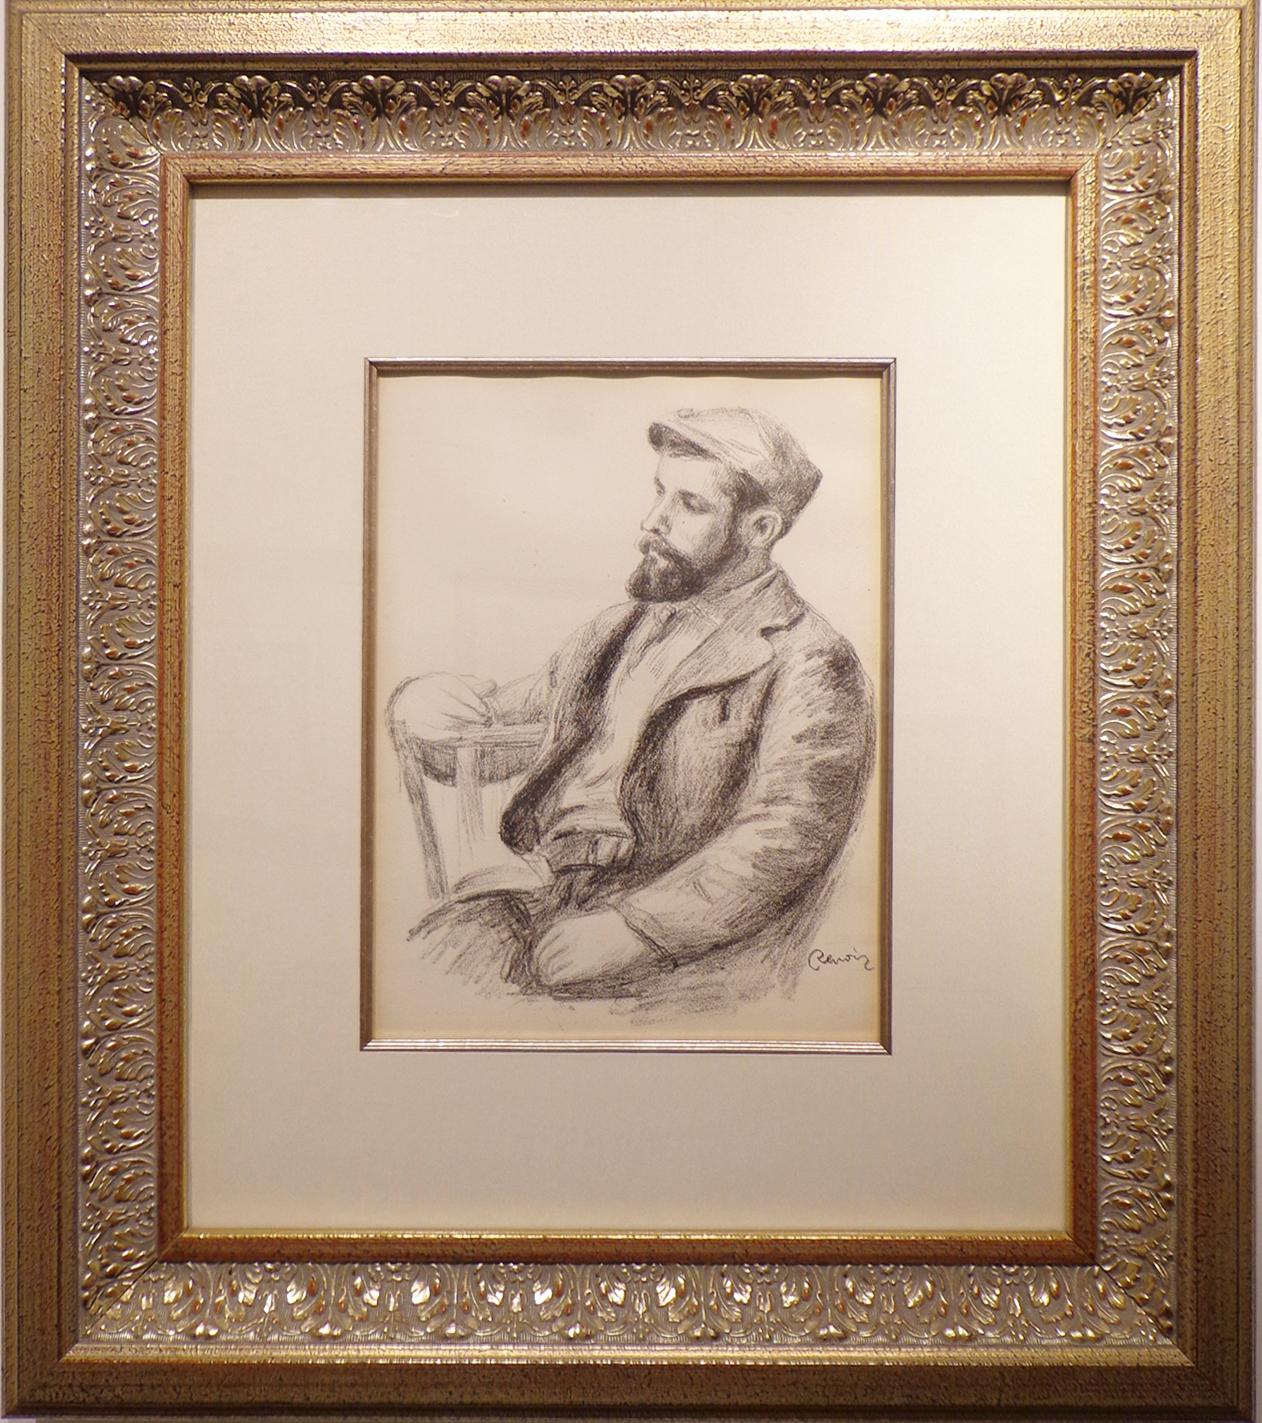 Renoir, Louis Valtat